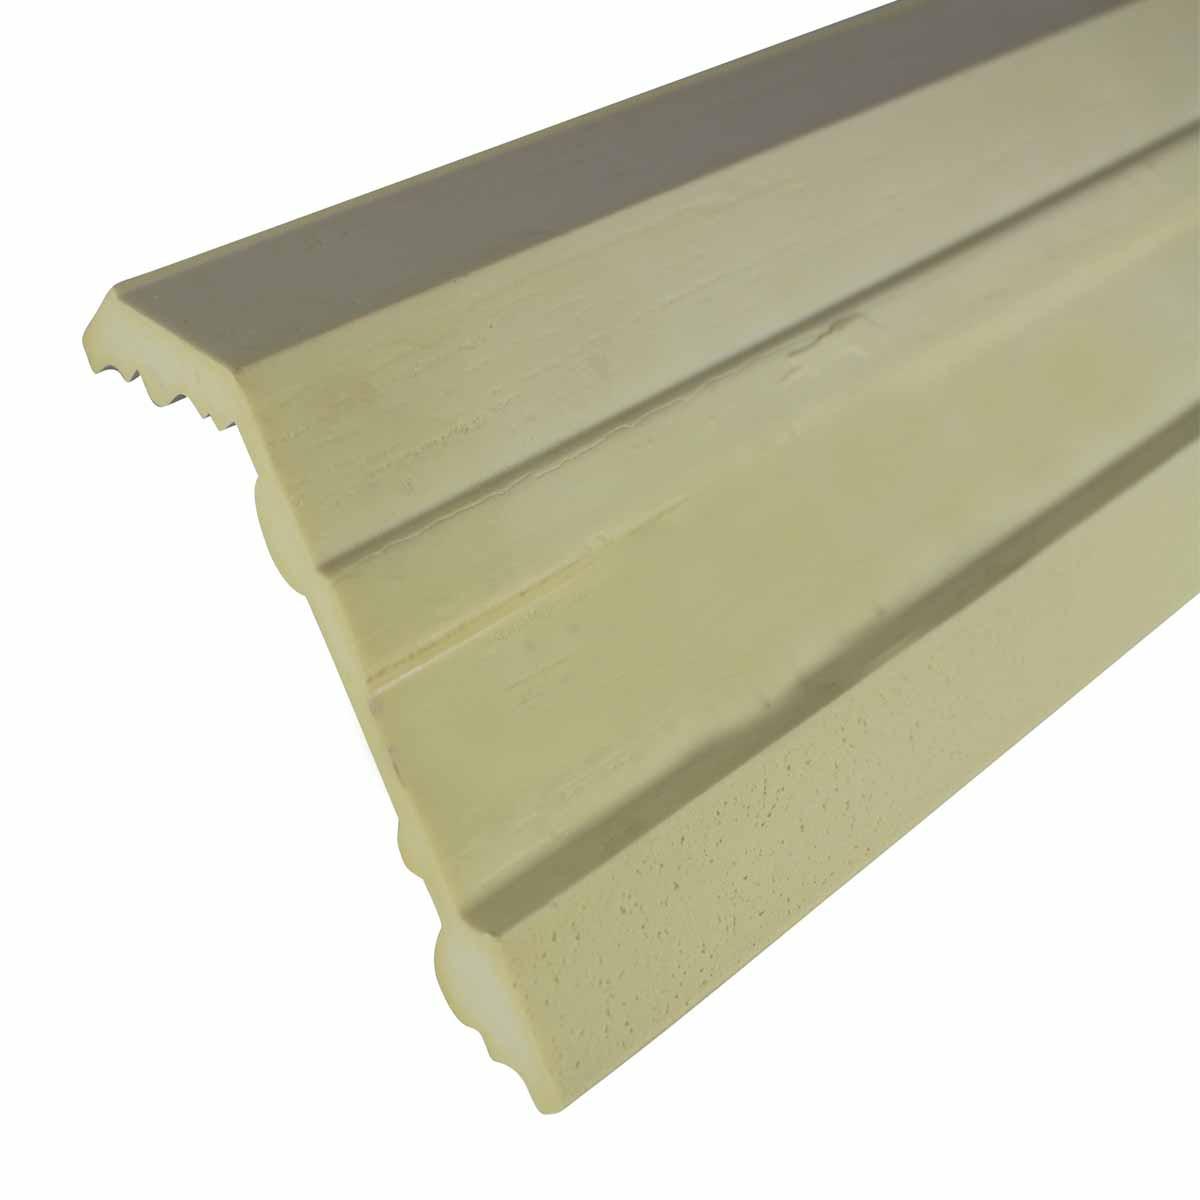 Cornice White Urethane Sample of 10976 23.5 Long Cornice Cornice Moulding Cornice Molding